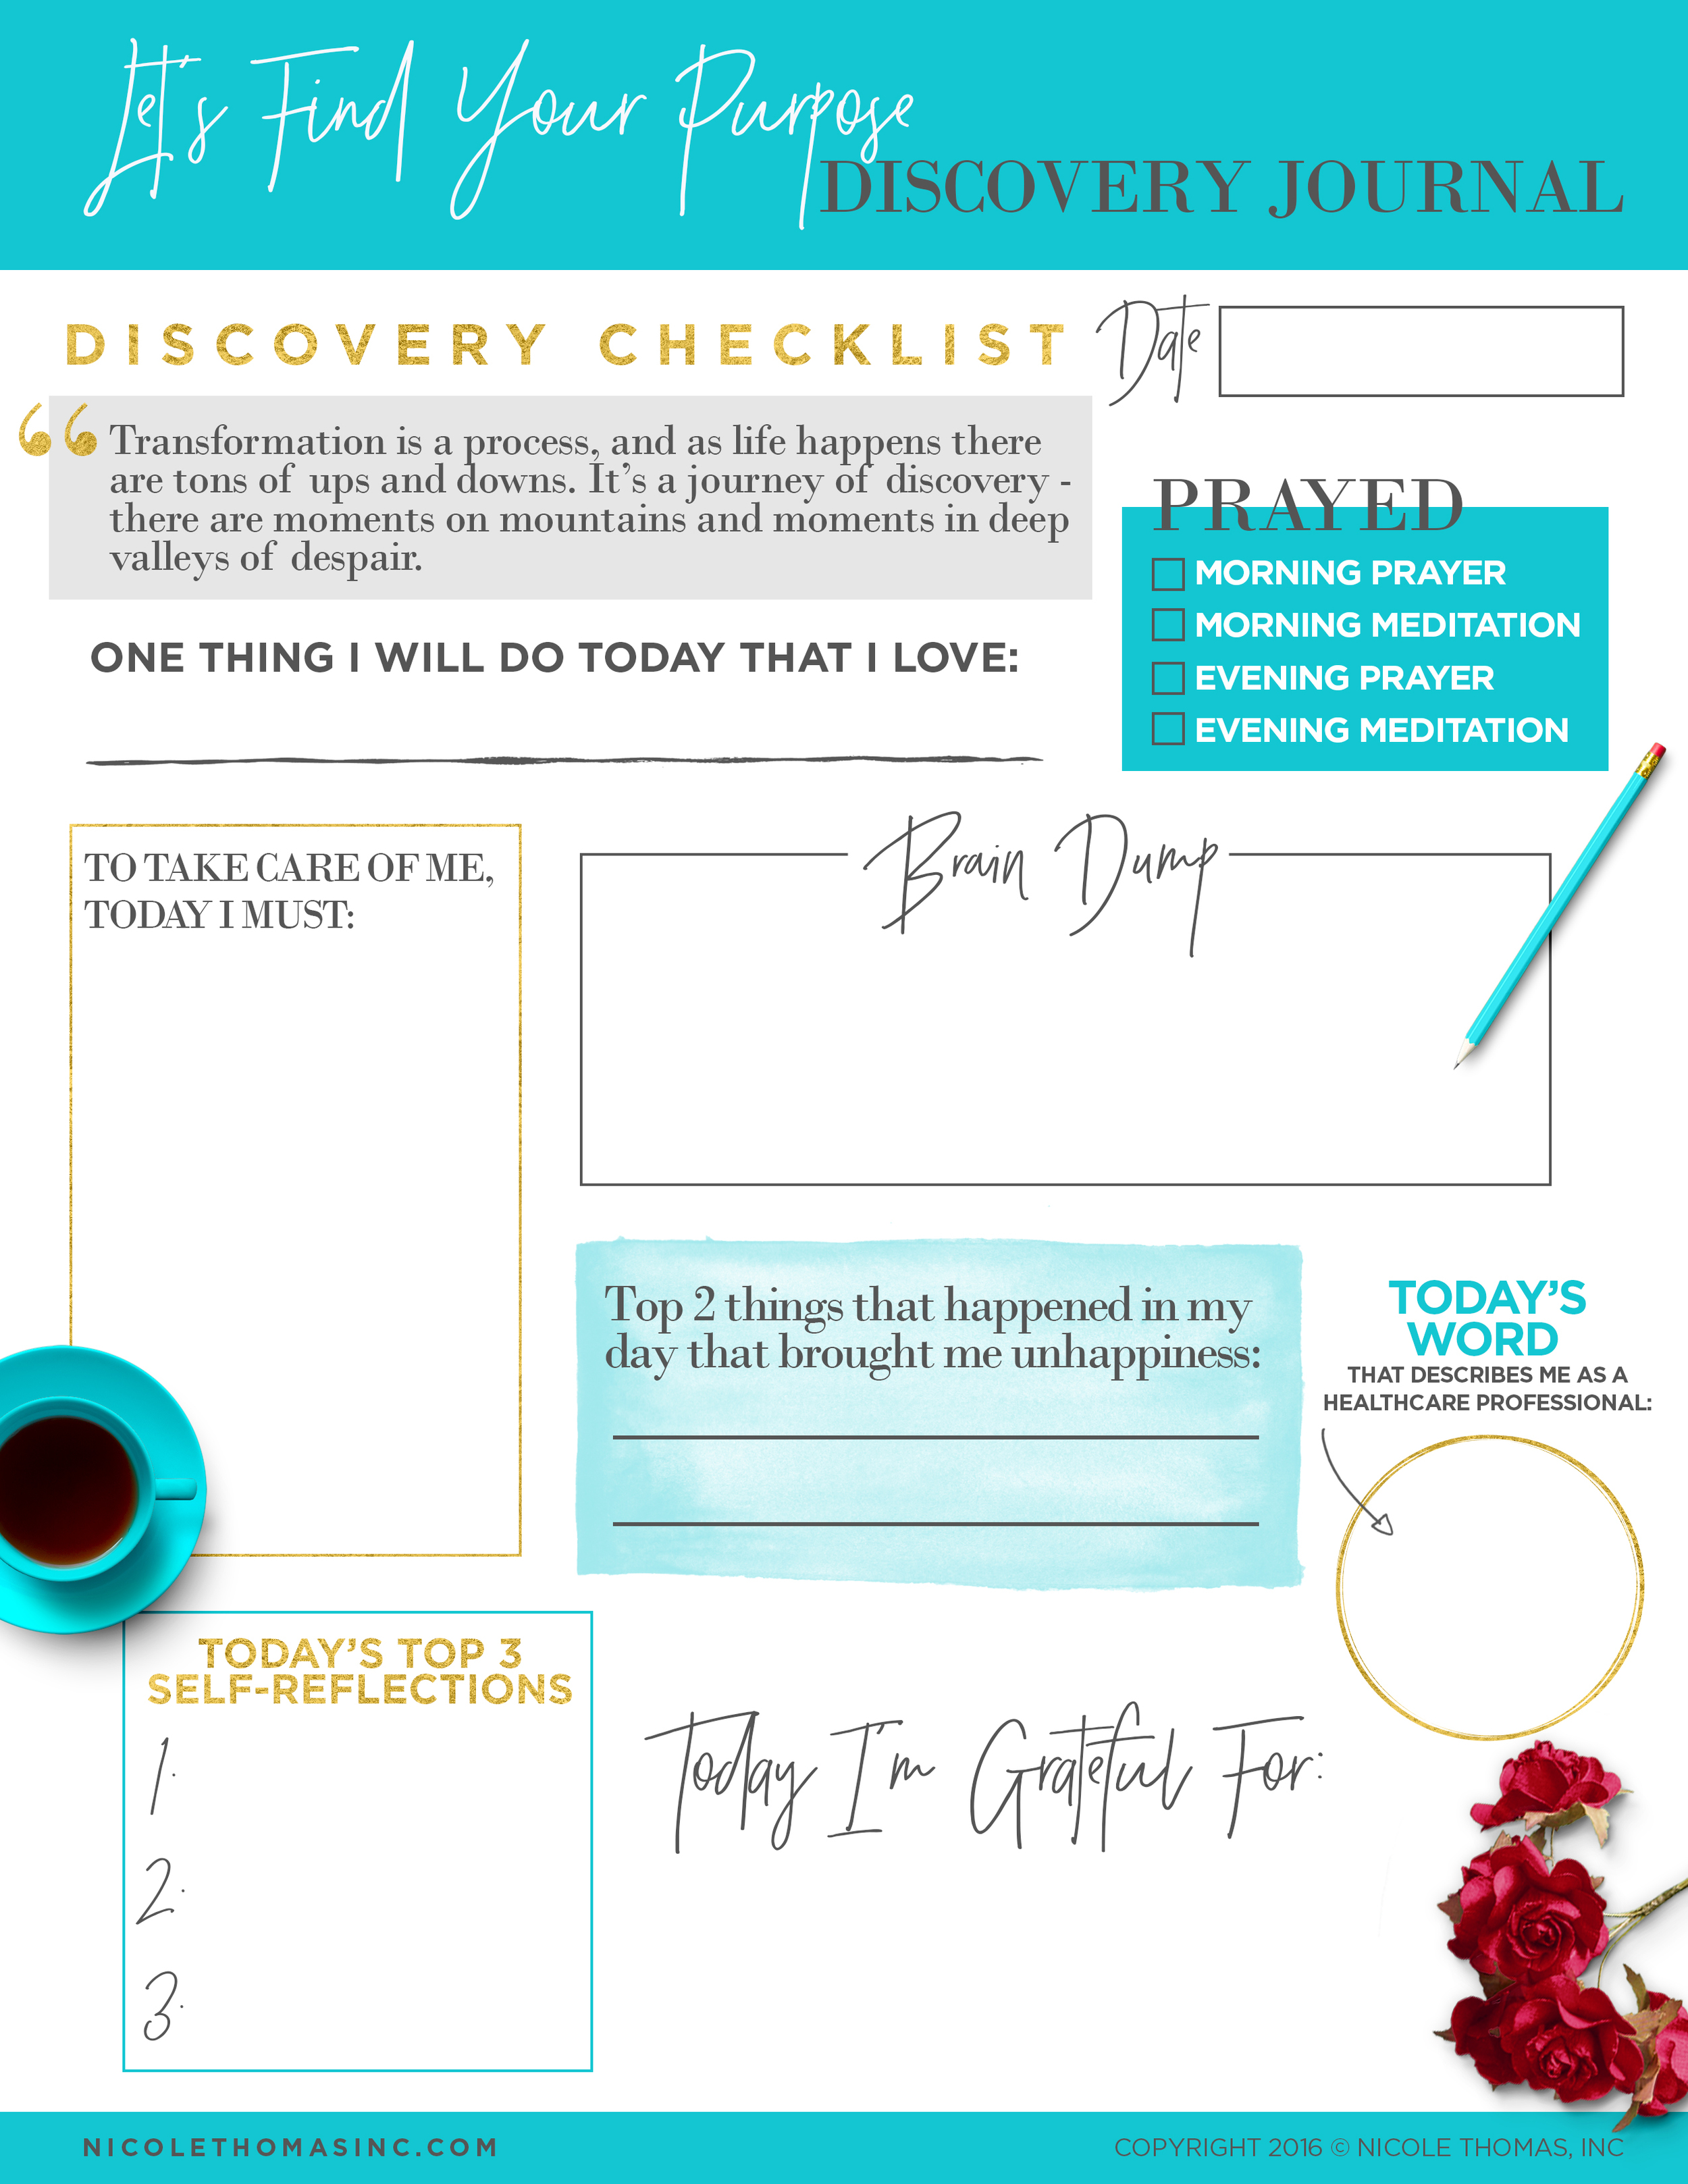 Journal_Discovery_Checklist.jpg